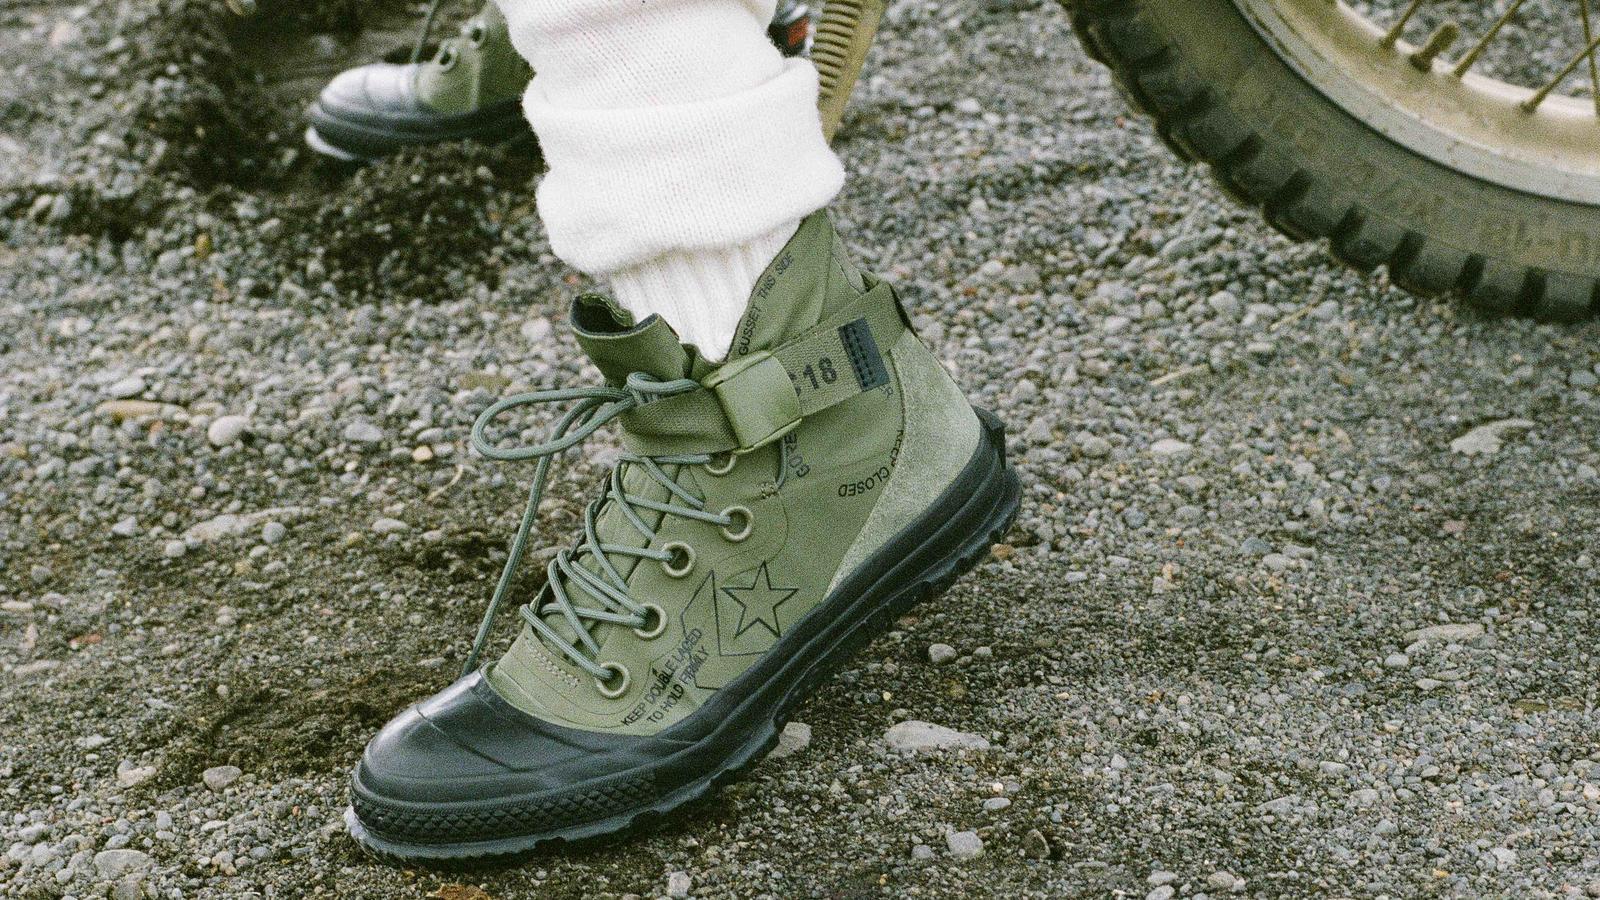 7f8322cd6d6 Converse Mountain Club Capsule - Nike News